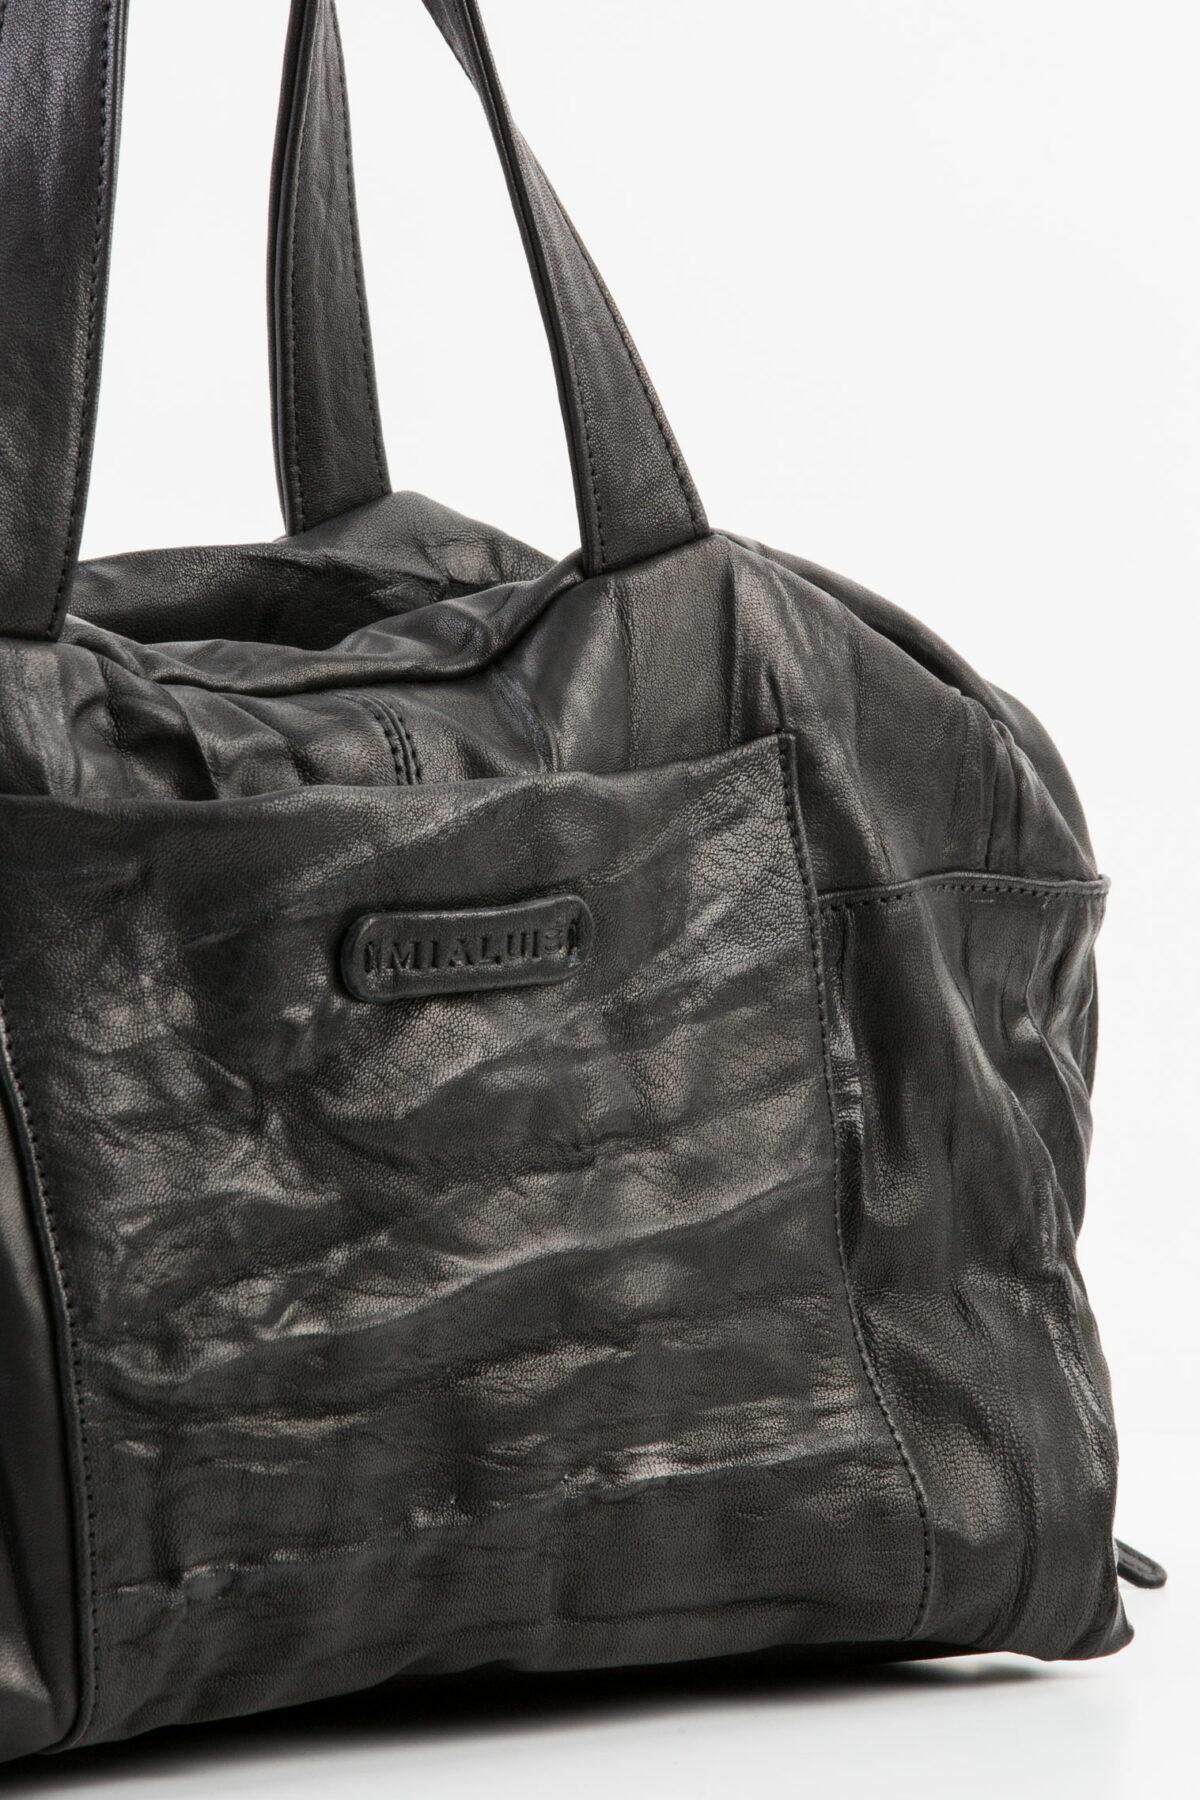 cri-leather-bag-black-shoulder-shopping-light-pleated-mialuis-matchboxathens